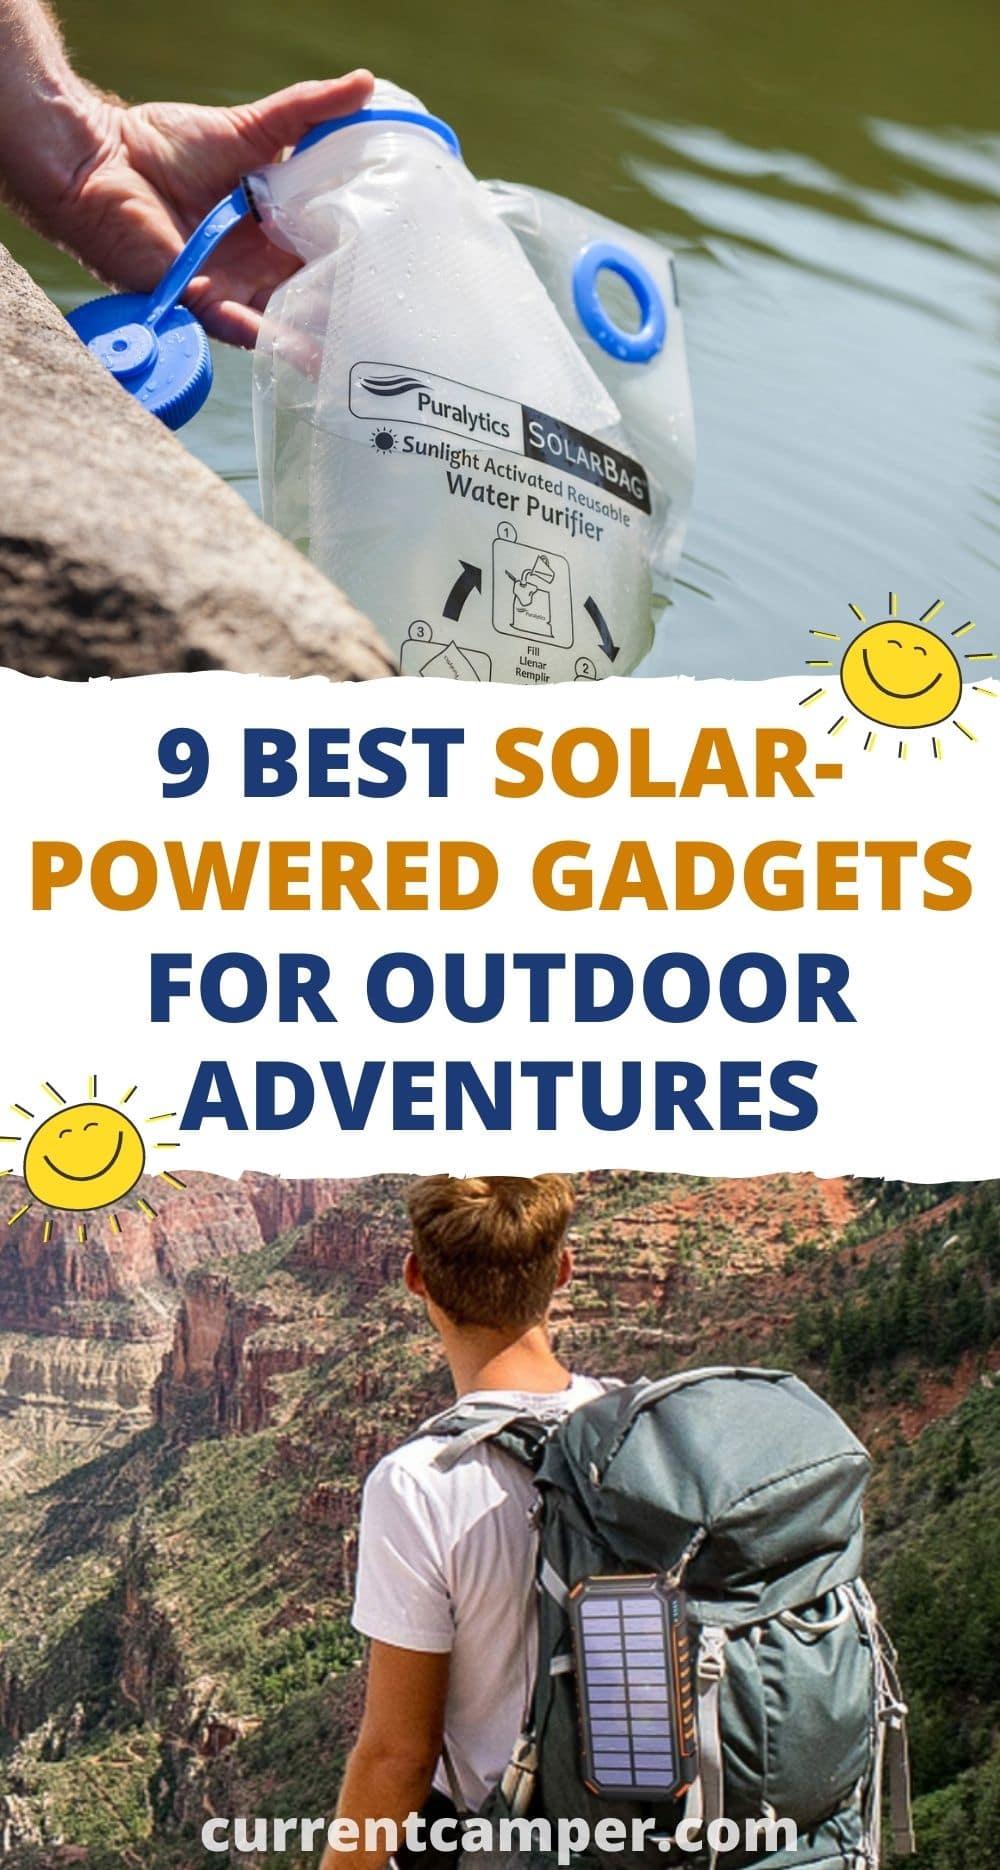 9 best solar-powered gadgets for outdoor adventures